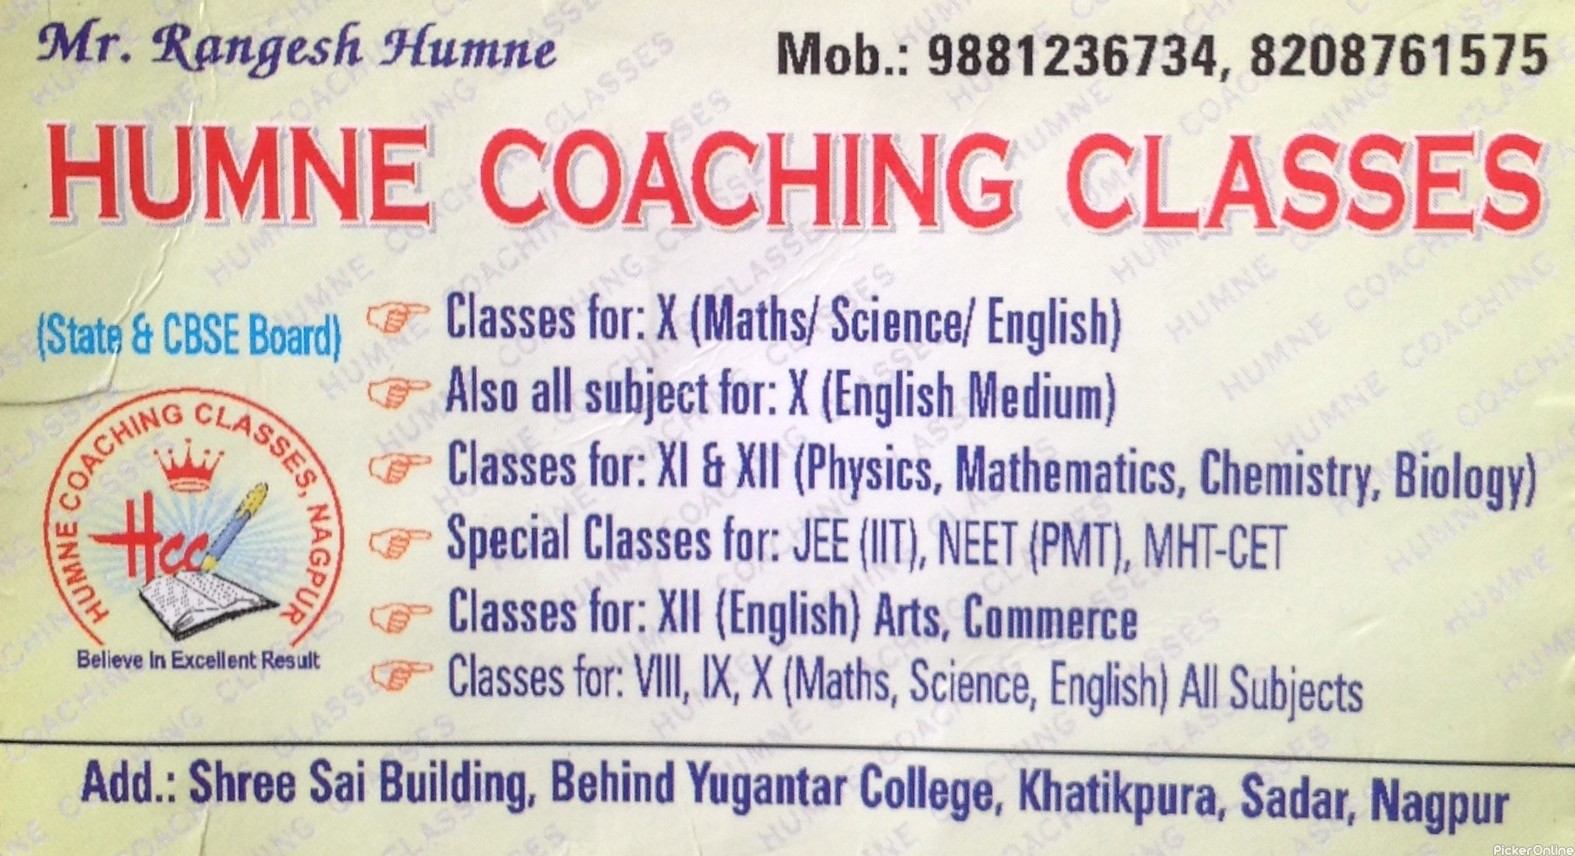 Humne Coaching Classes Sadar, Nagpur | Pickeronline